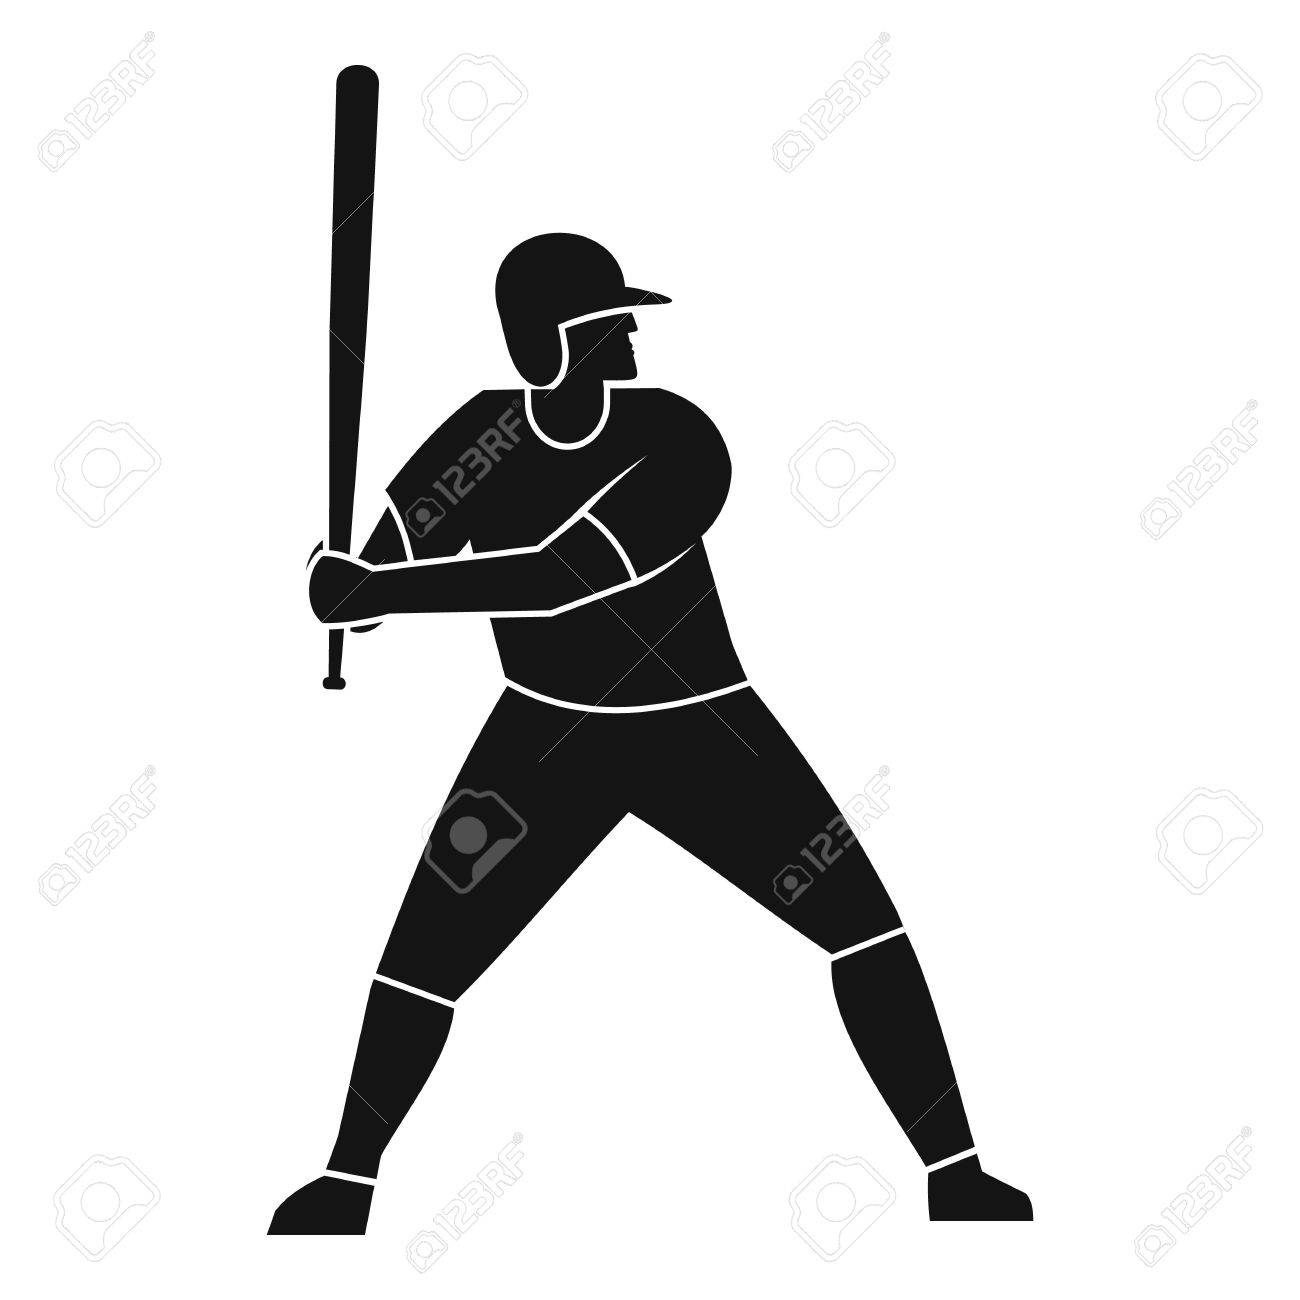 baseball player with bat icon simple style royalty free cliparts rh 123rf com Vector O Baseball Bat Baseball Bat Clip Art